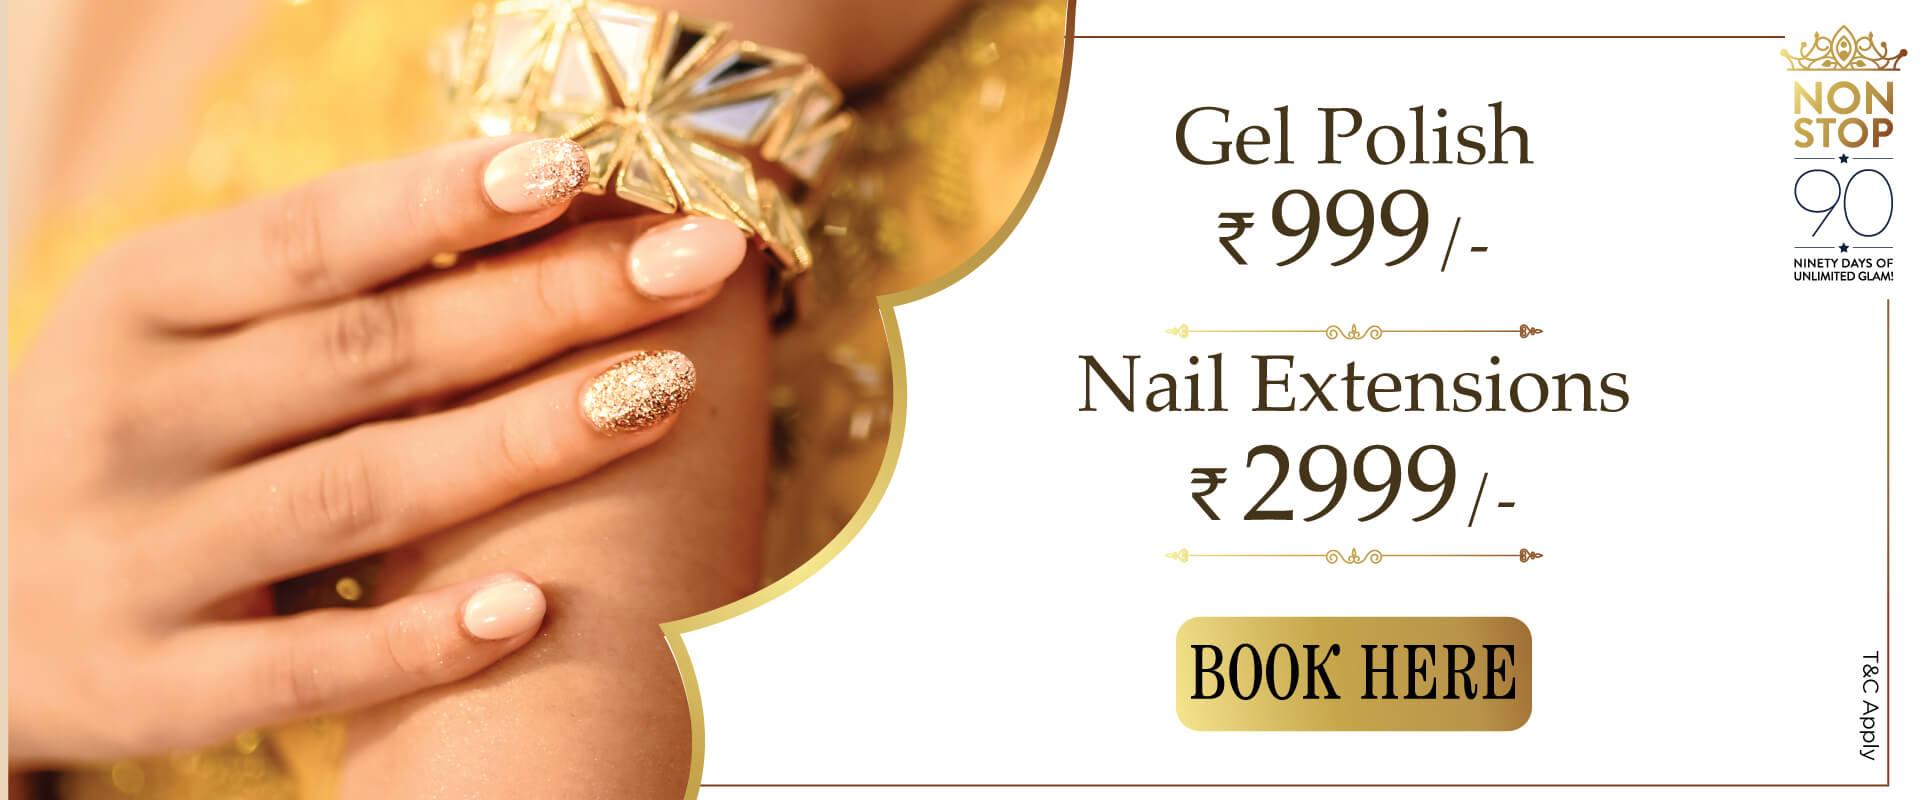 Nail Spa - Biguine India